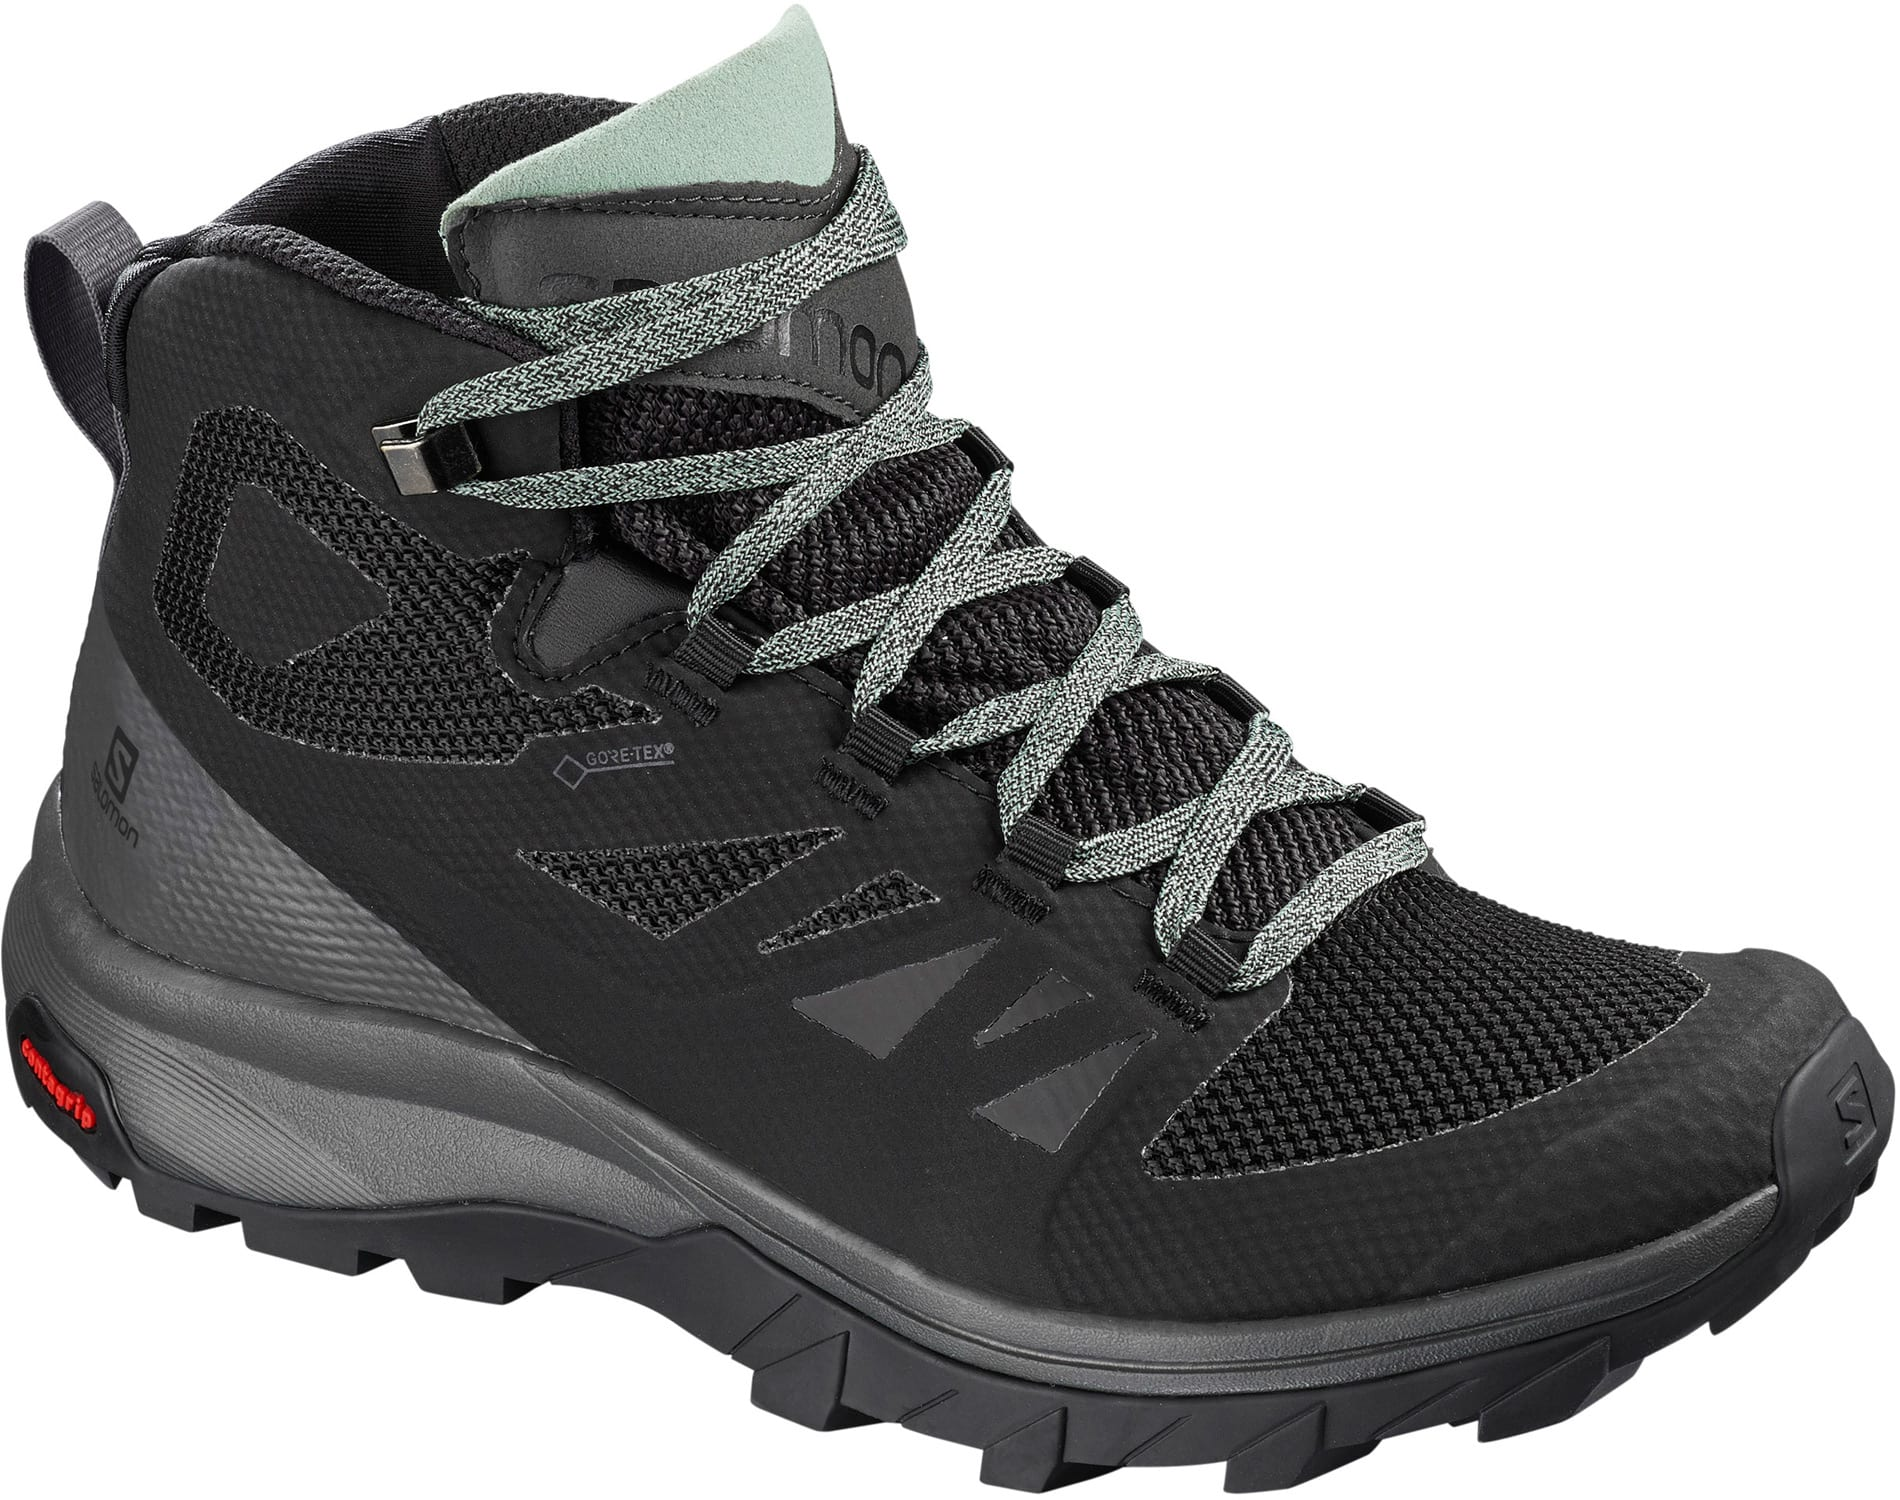 205a6e8b13 Salomon Outline Mid GTX Hiking Shoes